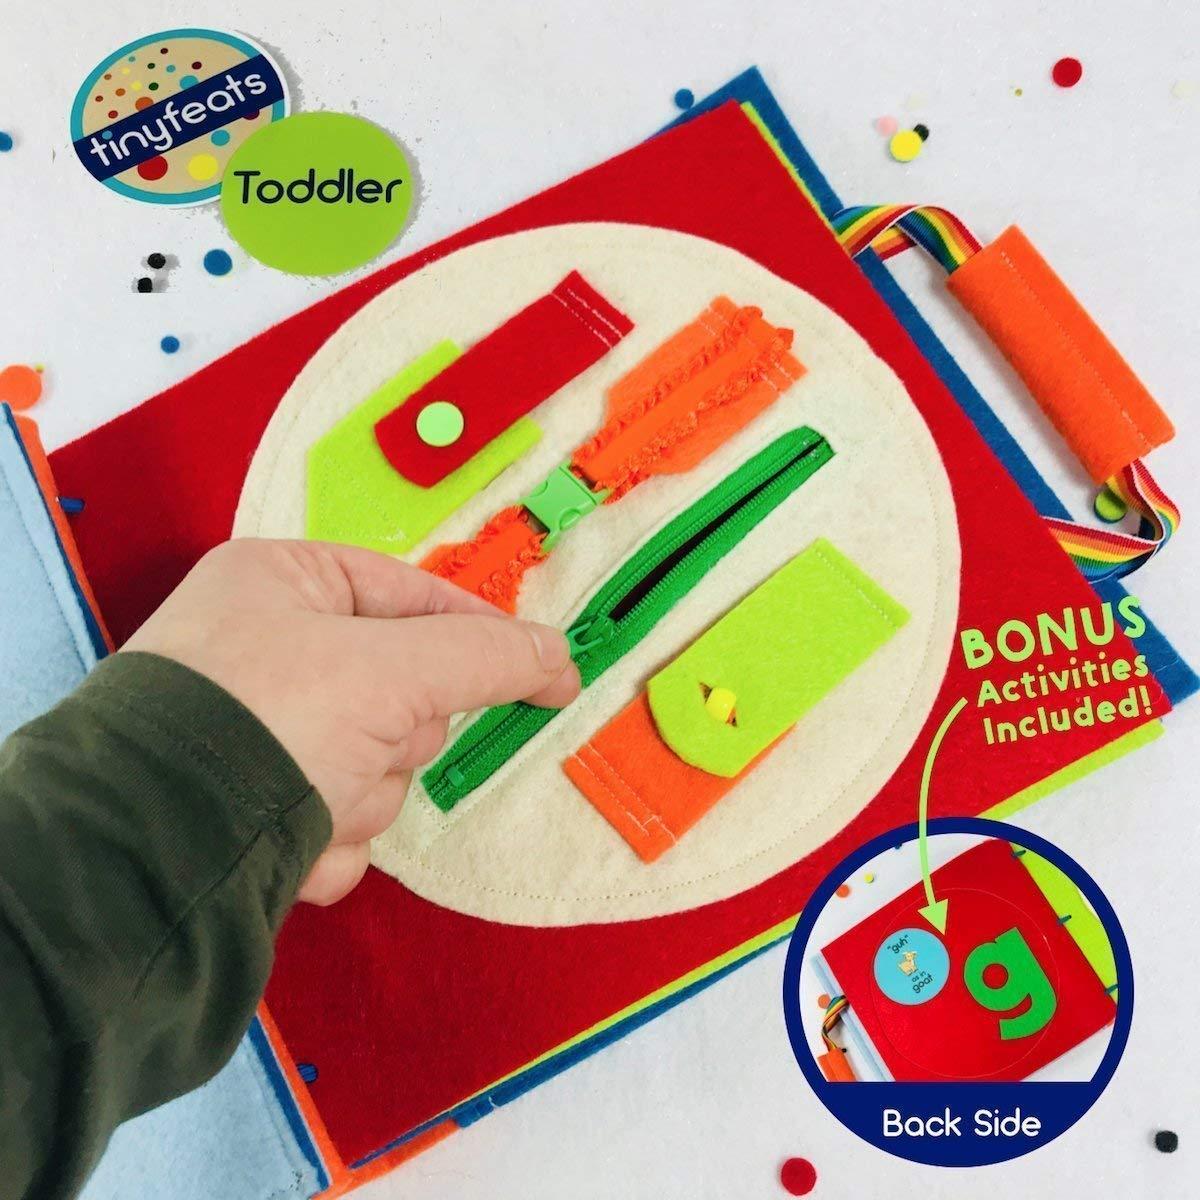 Amazon.com: Premium Quiet Book for 3 Year Old Boys - Kids ...